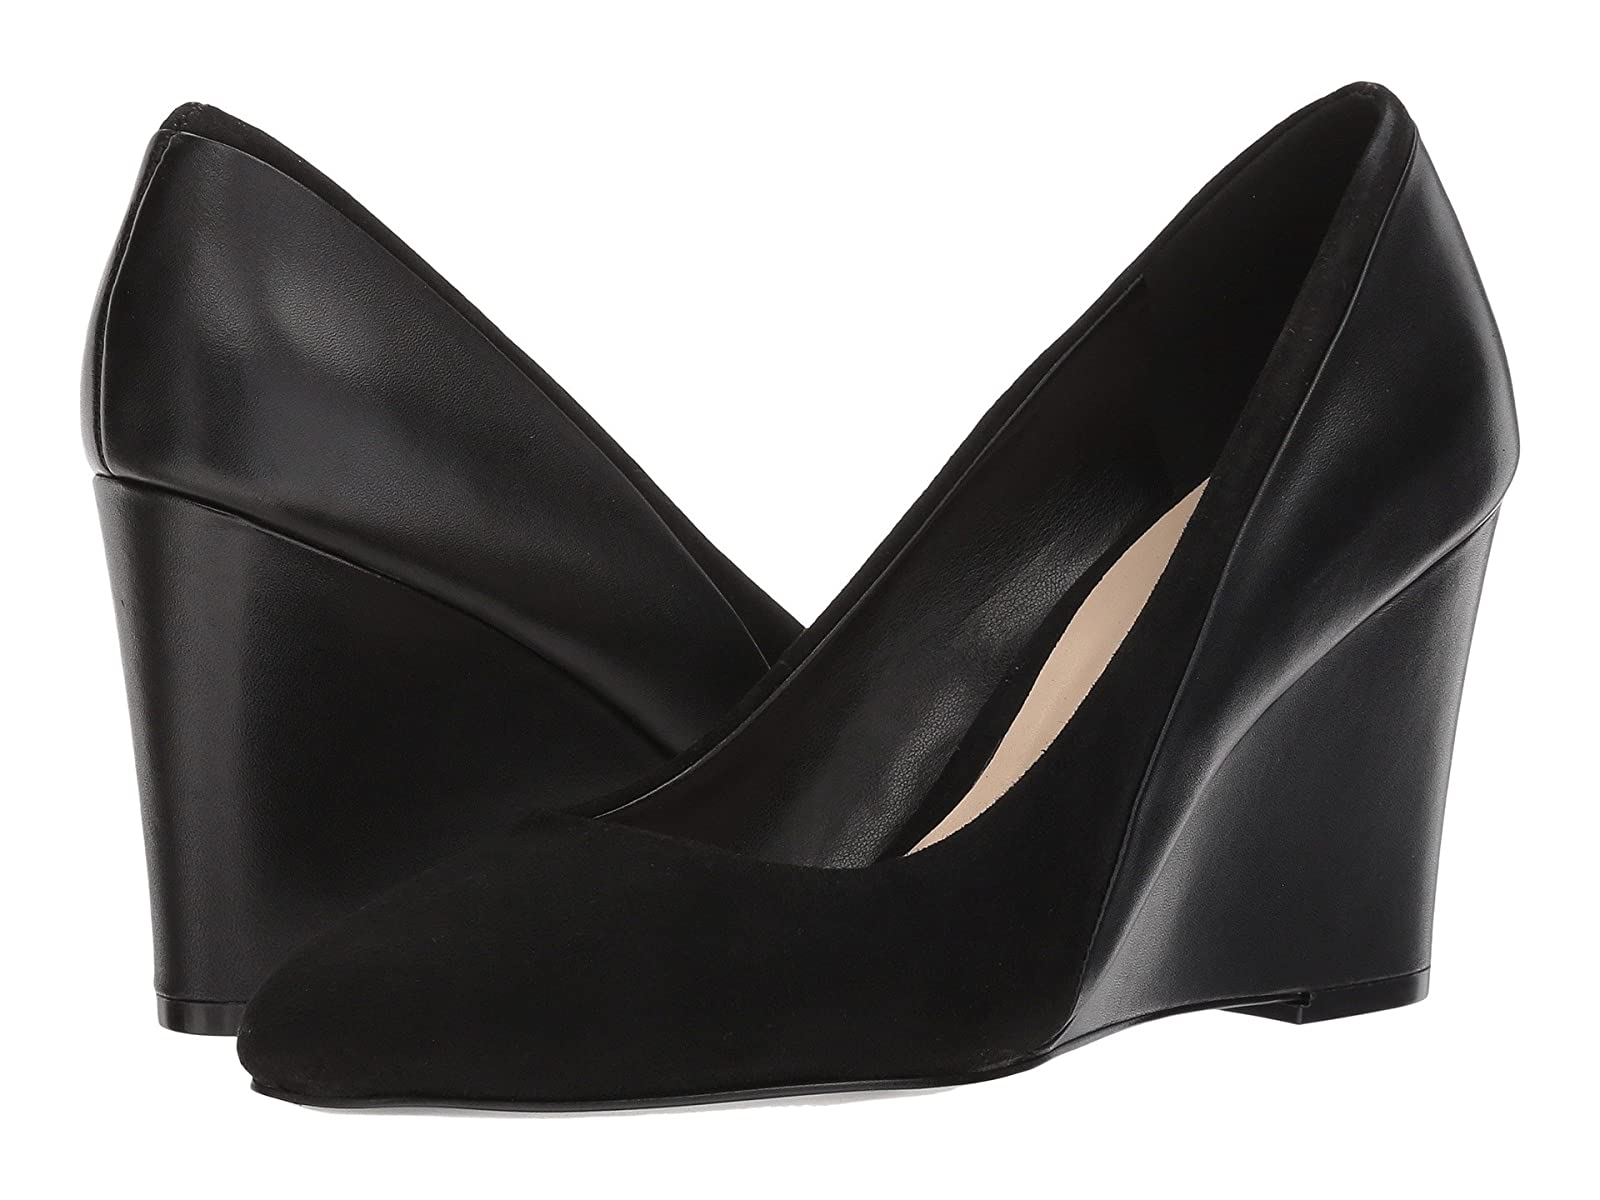 Nine West Daday Dress WedgeAtmospheric grades have affordable shoes